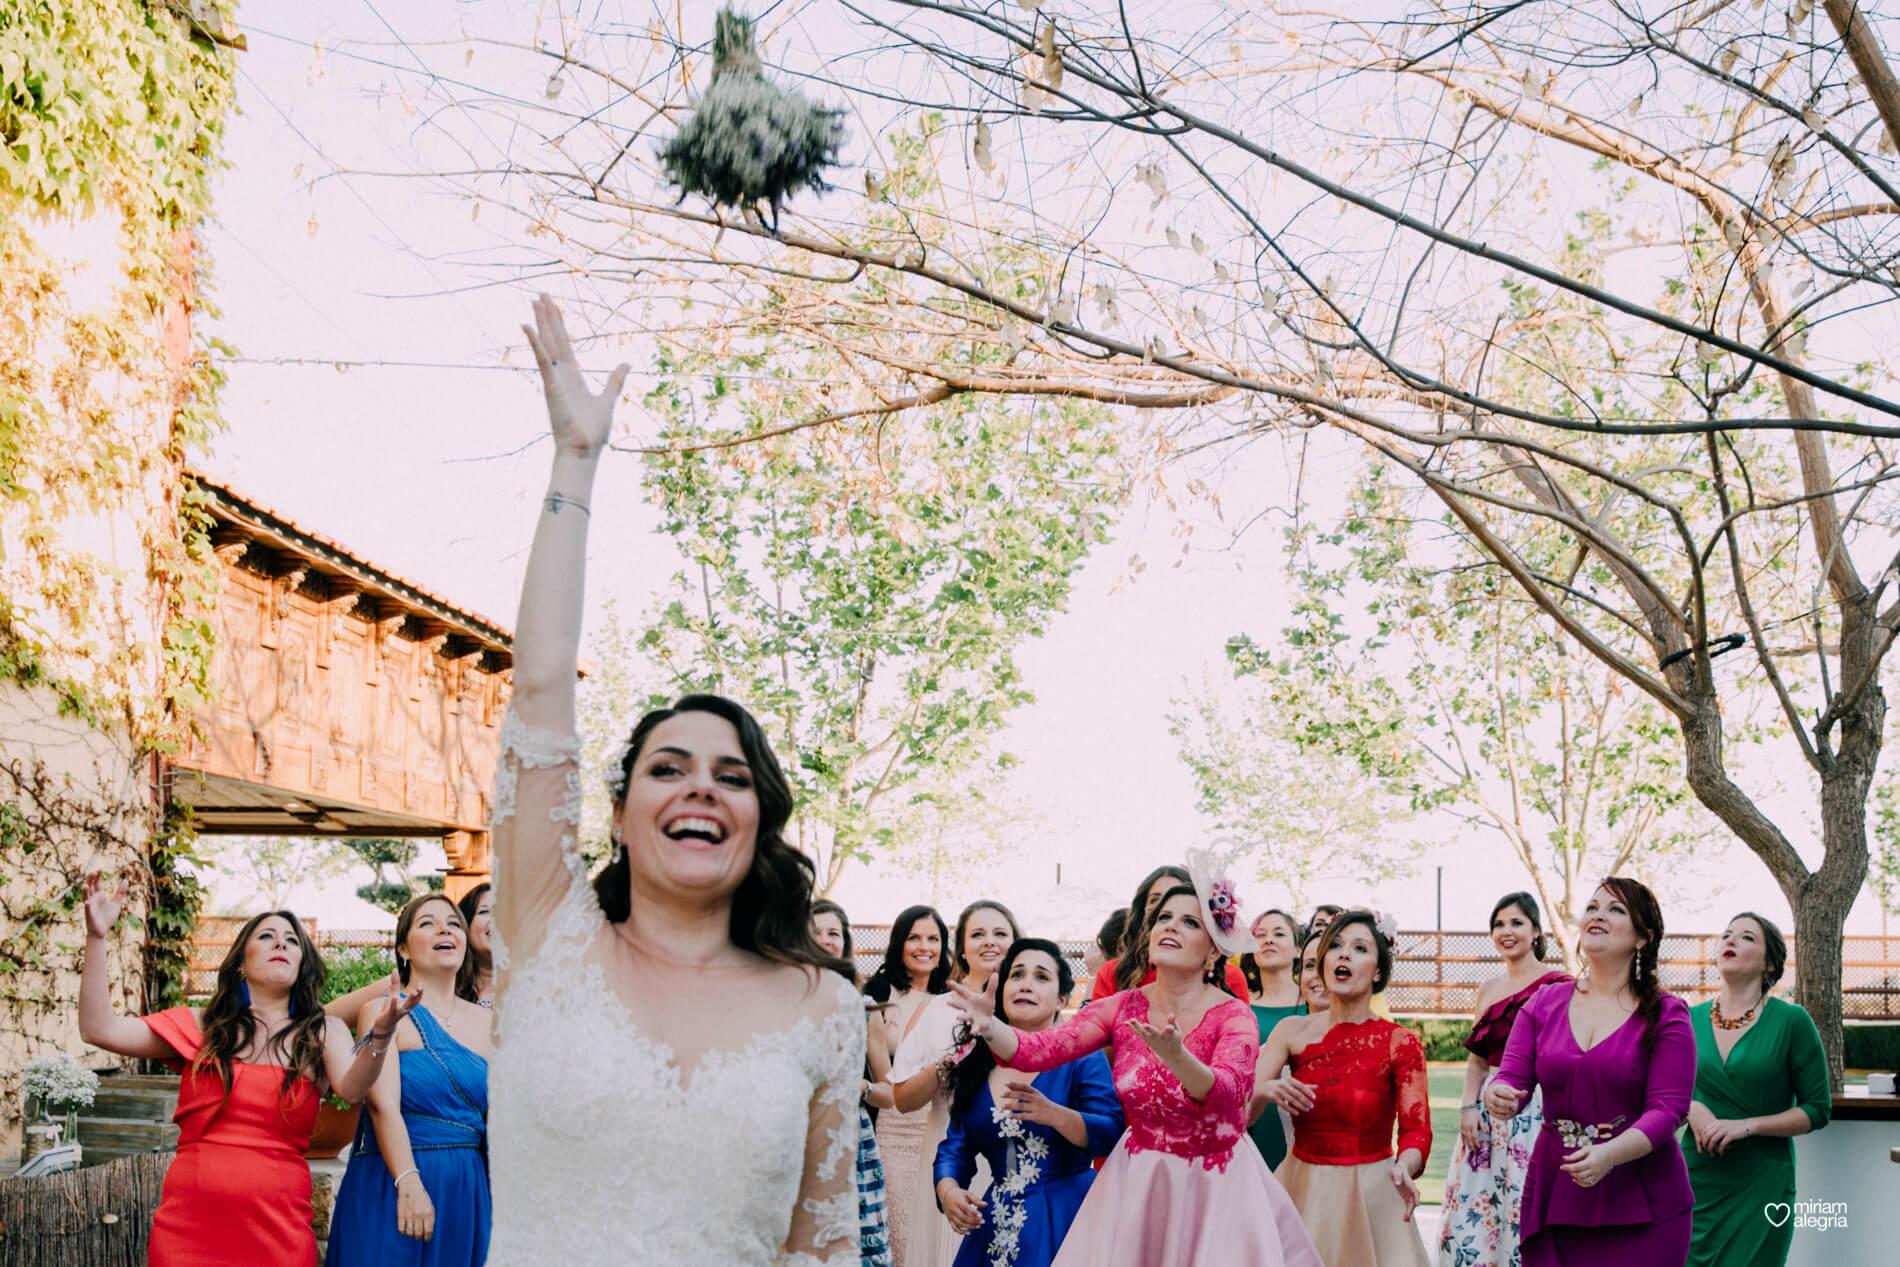 boda-en-finca-jurosa-miriam-alegria-136